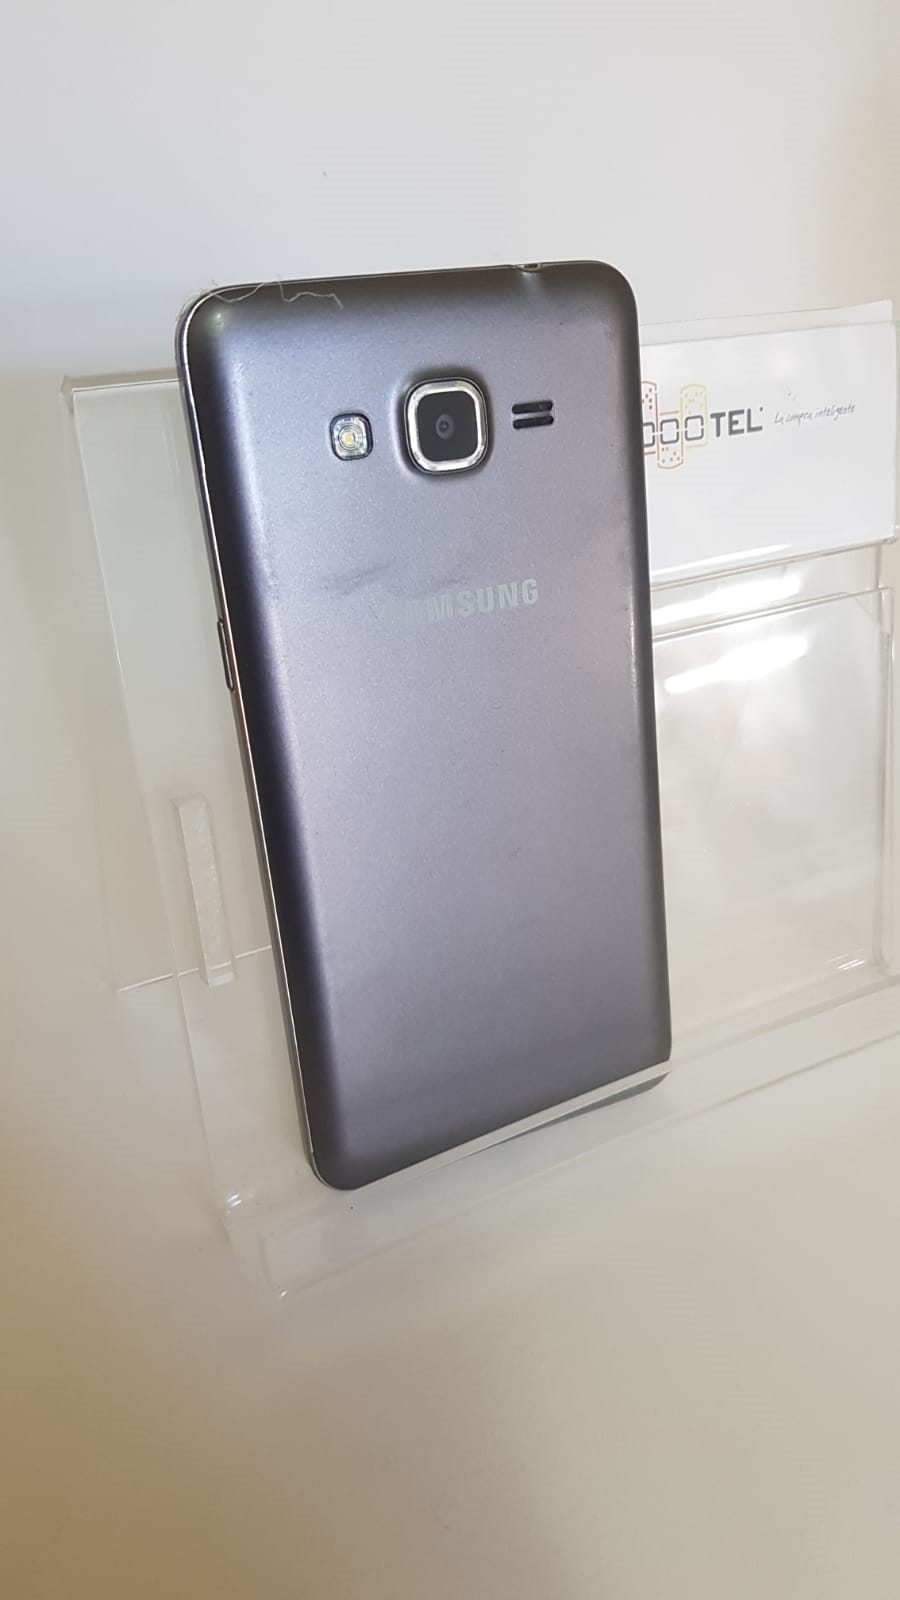 Samsung Galaxy Grand Prime #2